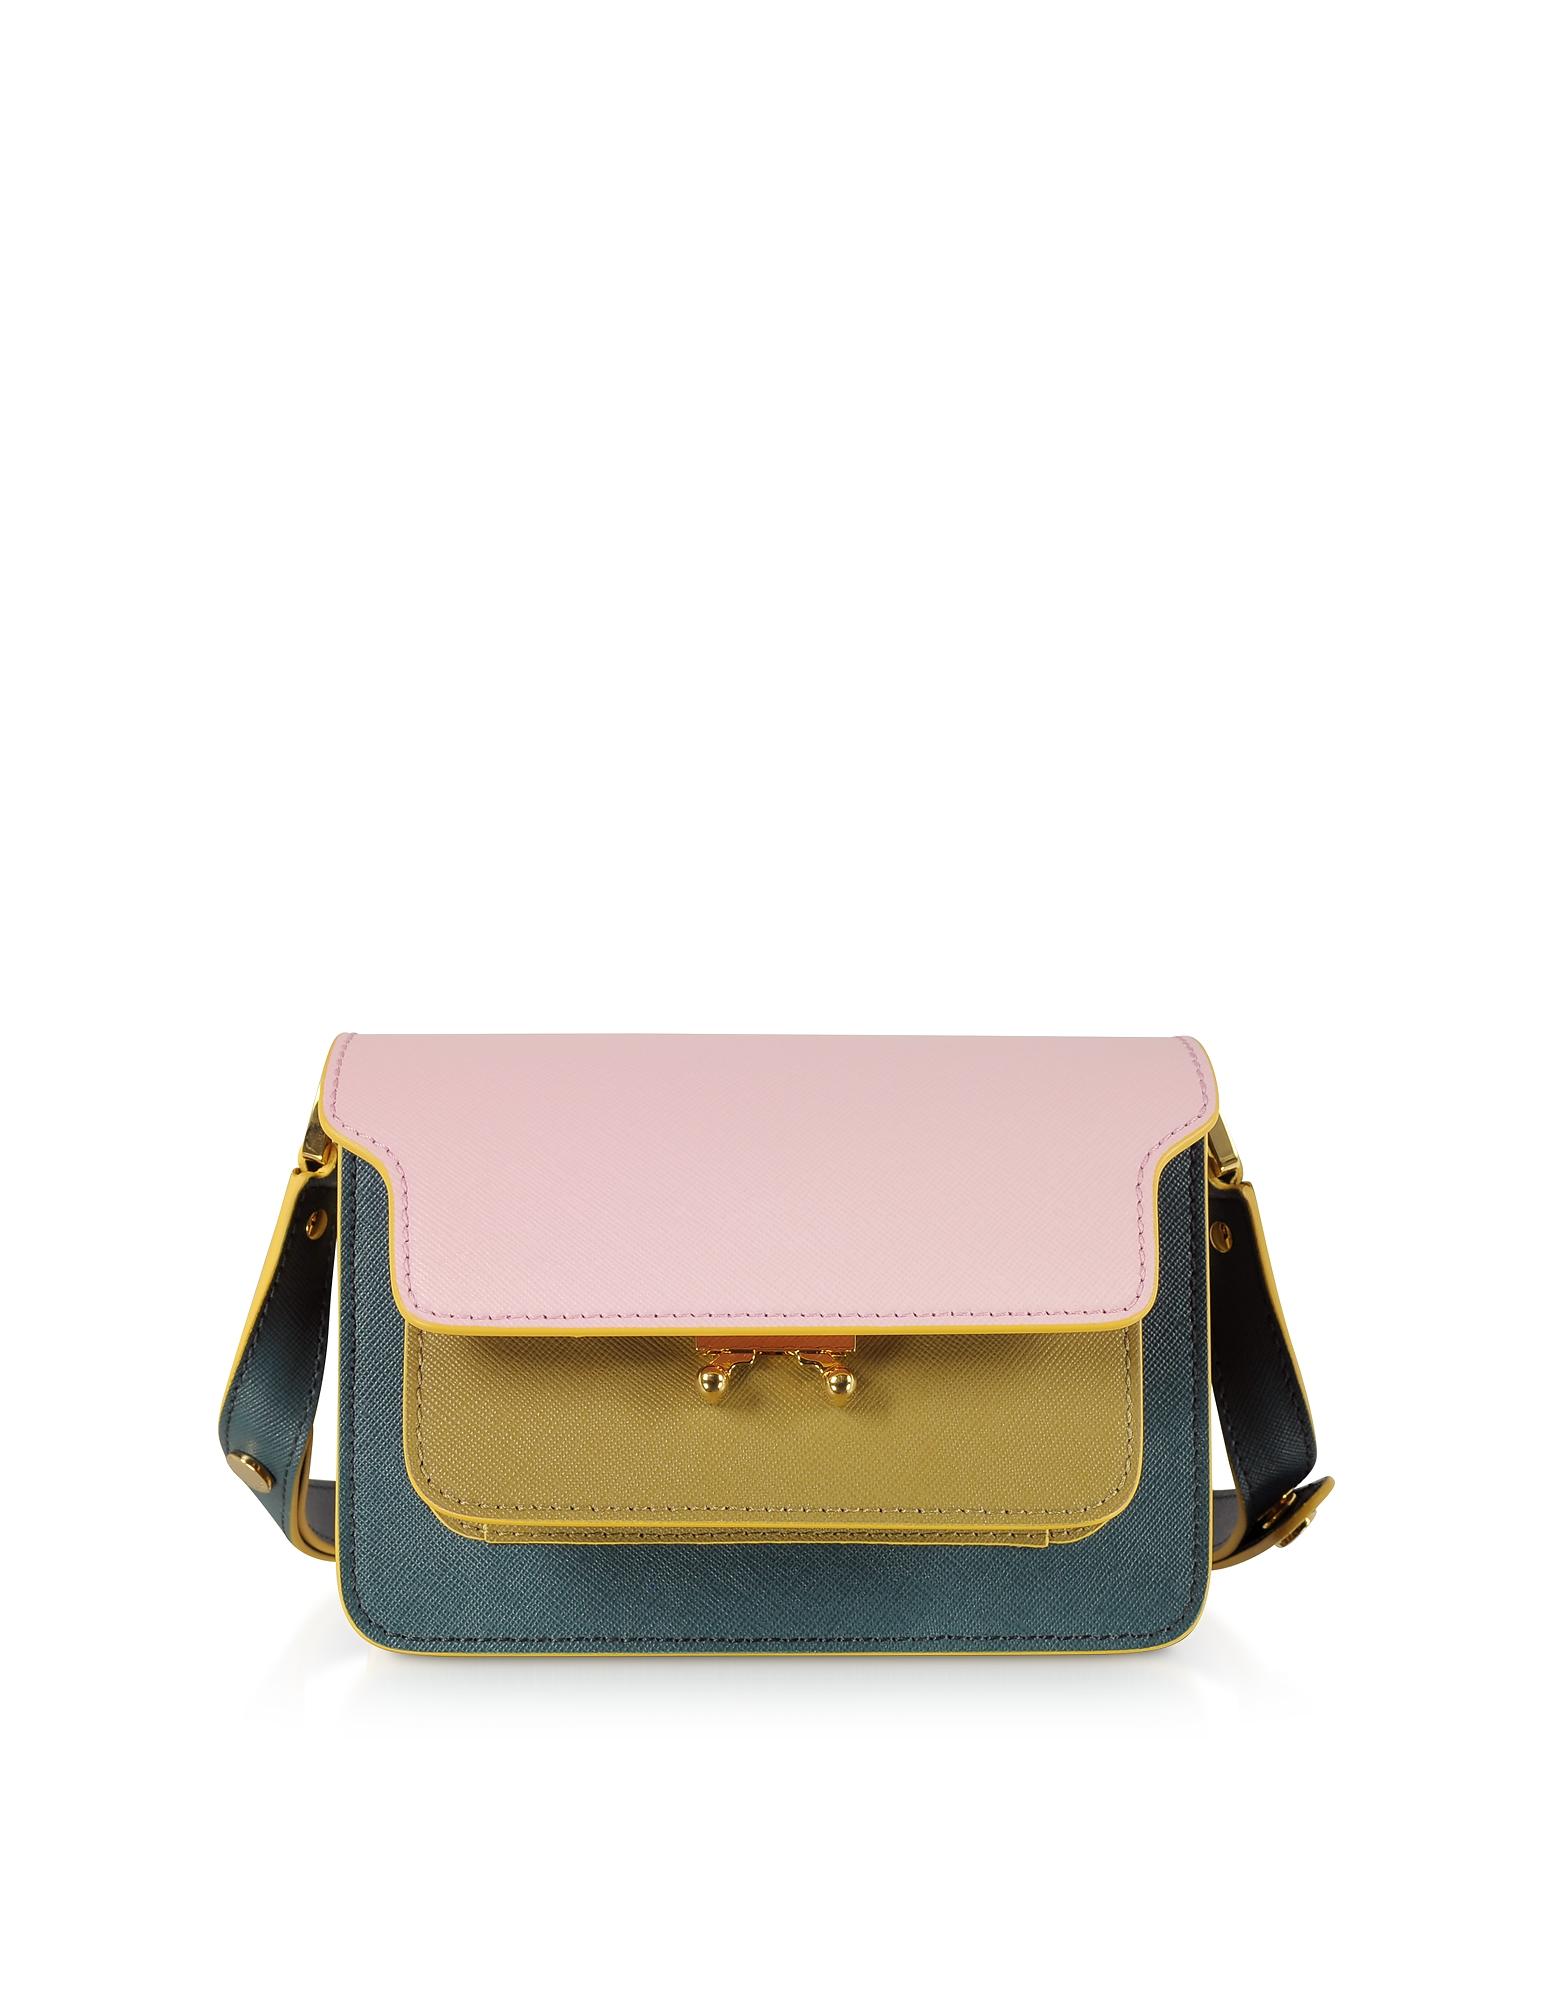 EAN 8050267612647 product image for Marni Designer Handbags, Color Block Saffiano Leather Micro Trunk Bag | upcitemdb.com